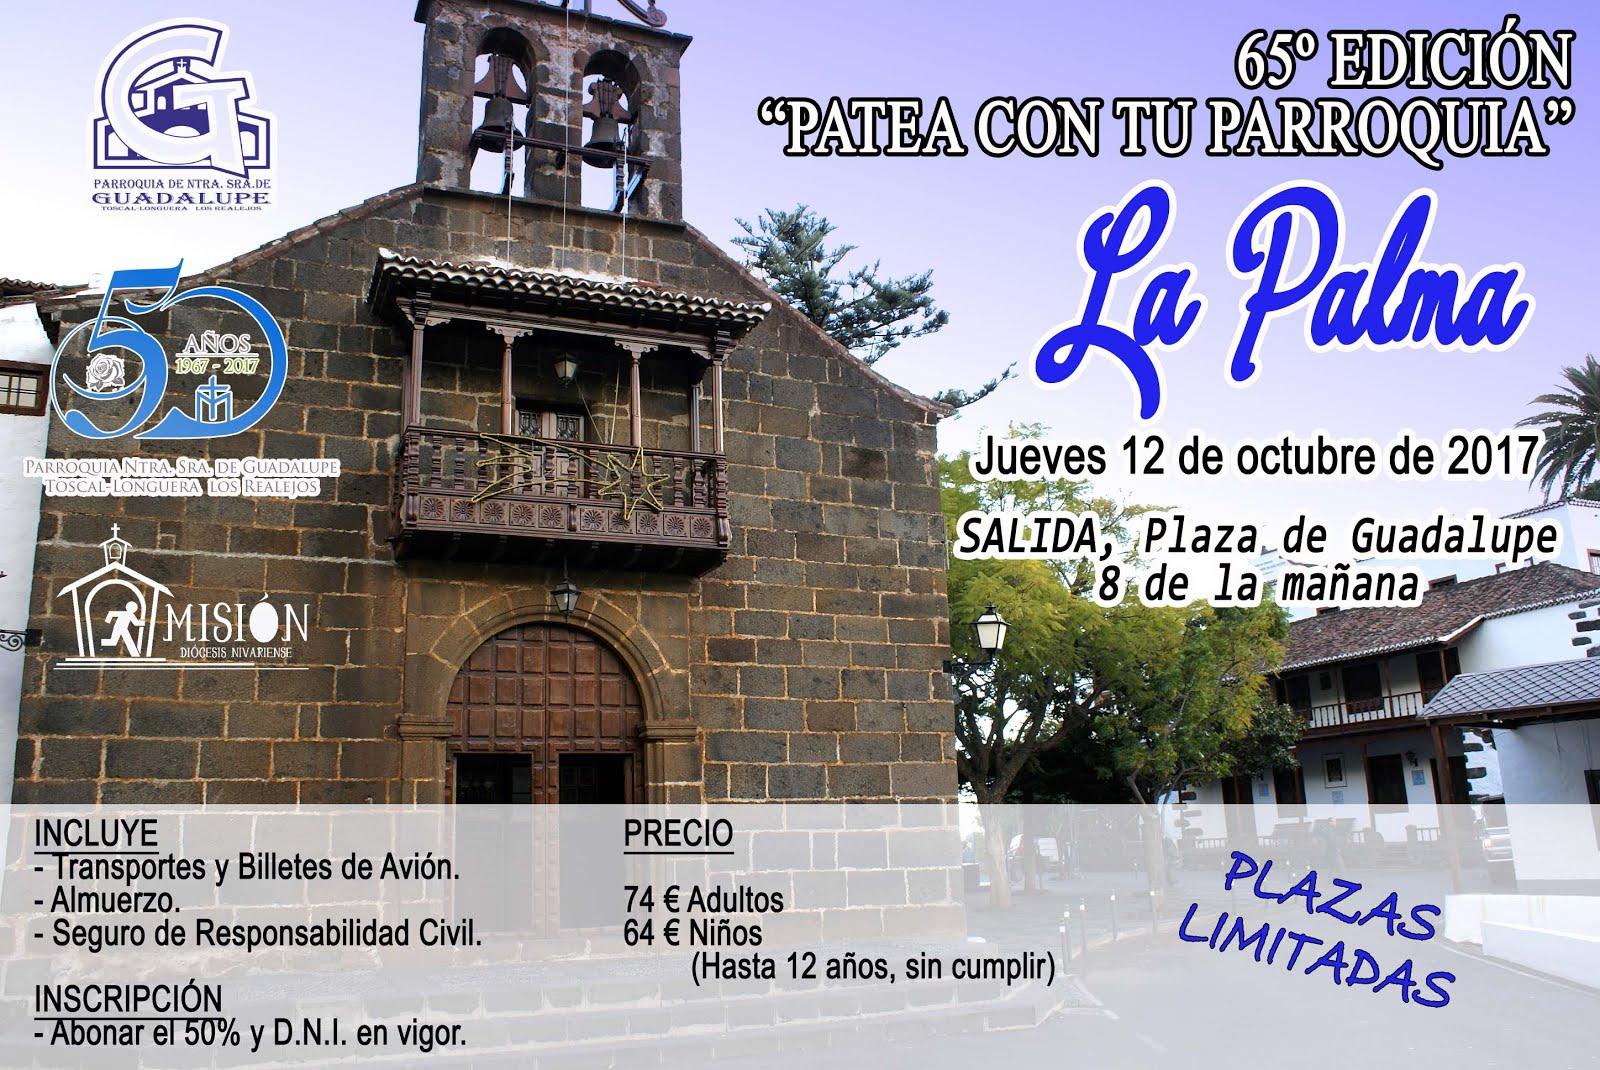 Patea Con Tú Parroquia: La Palma